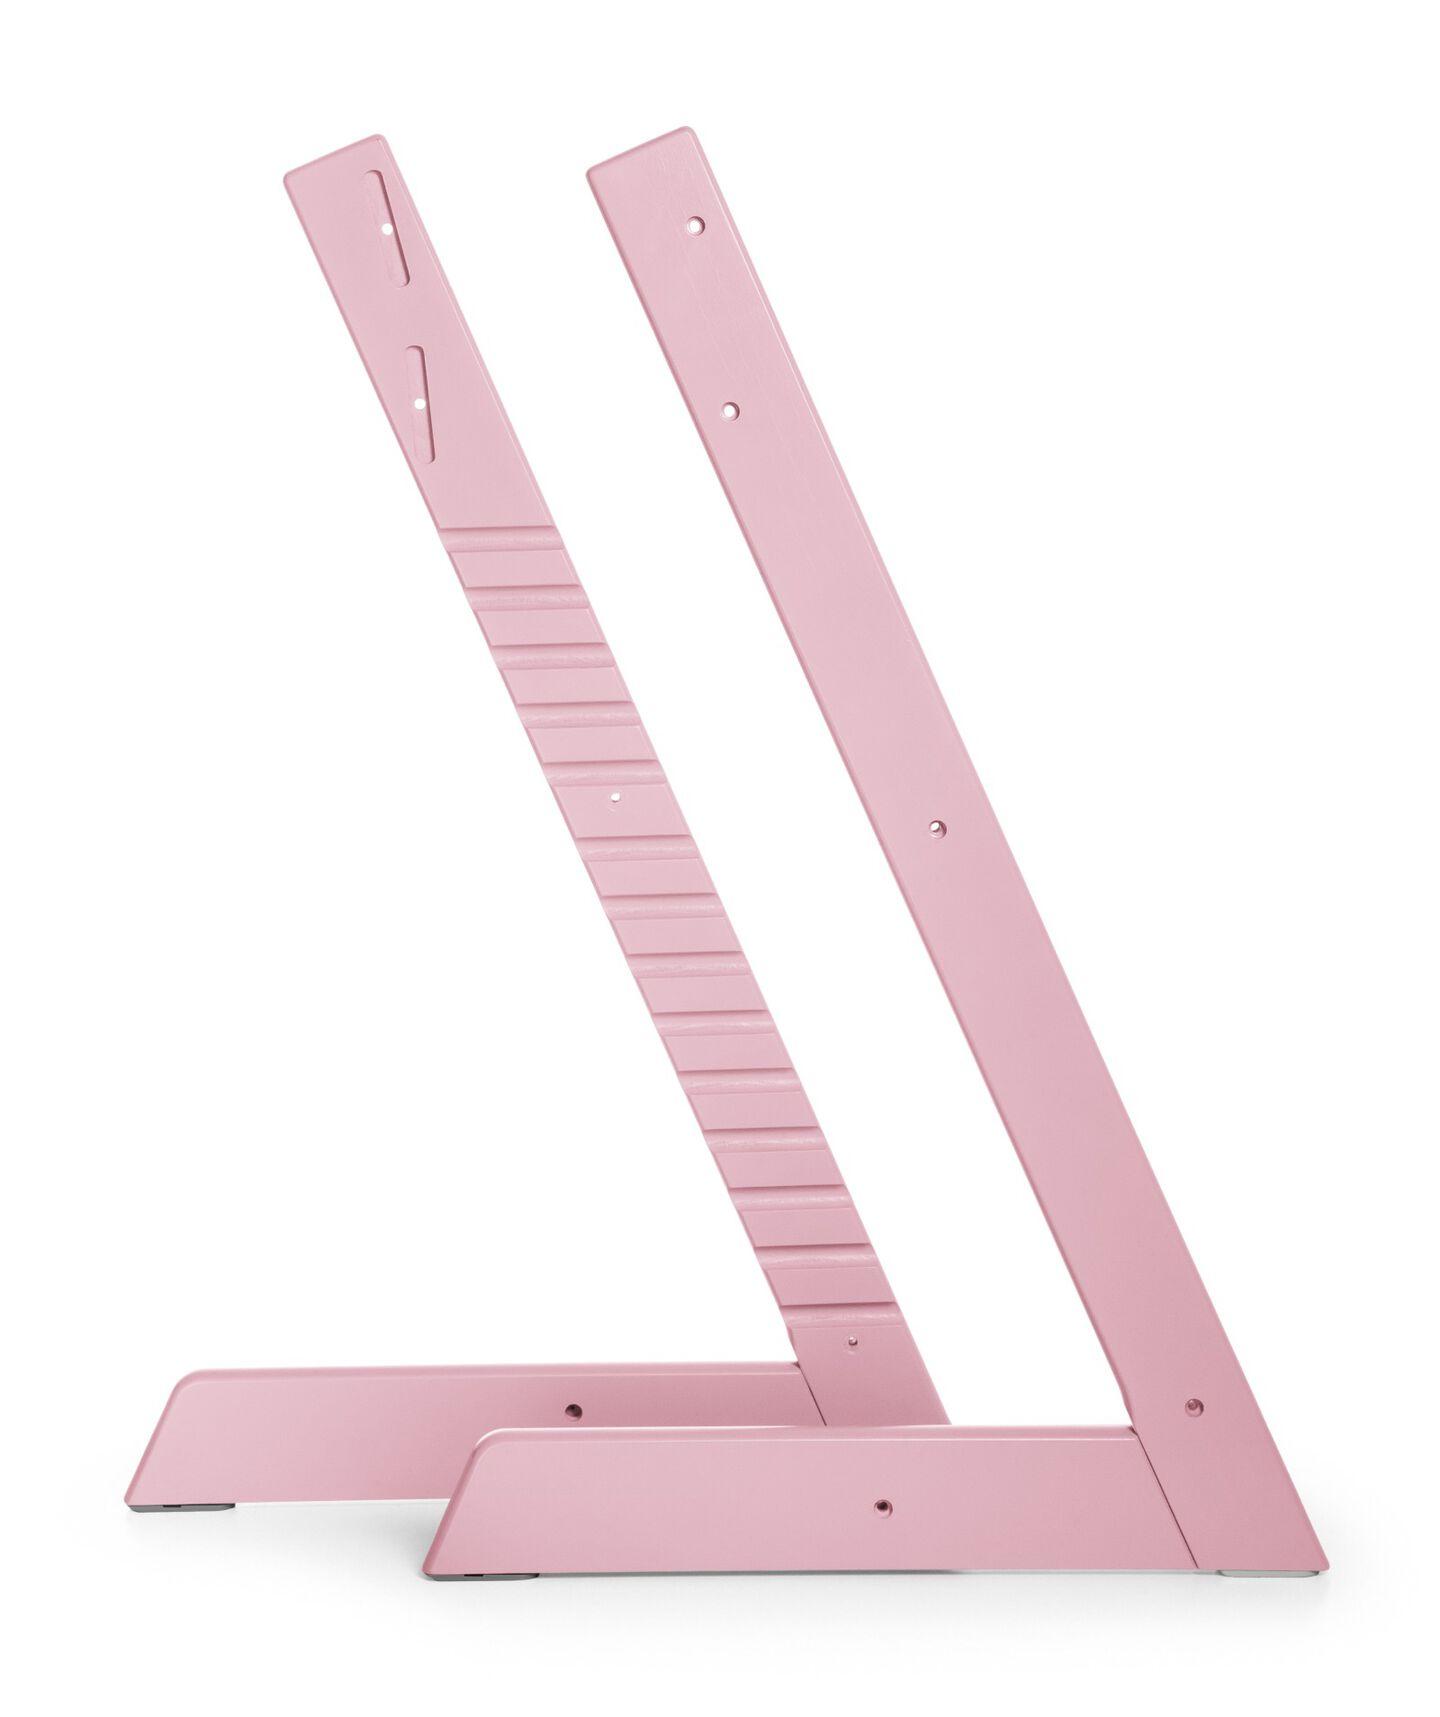 108530 Tripp Trapp Side set Pink (Spare part).